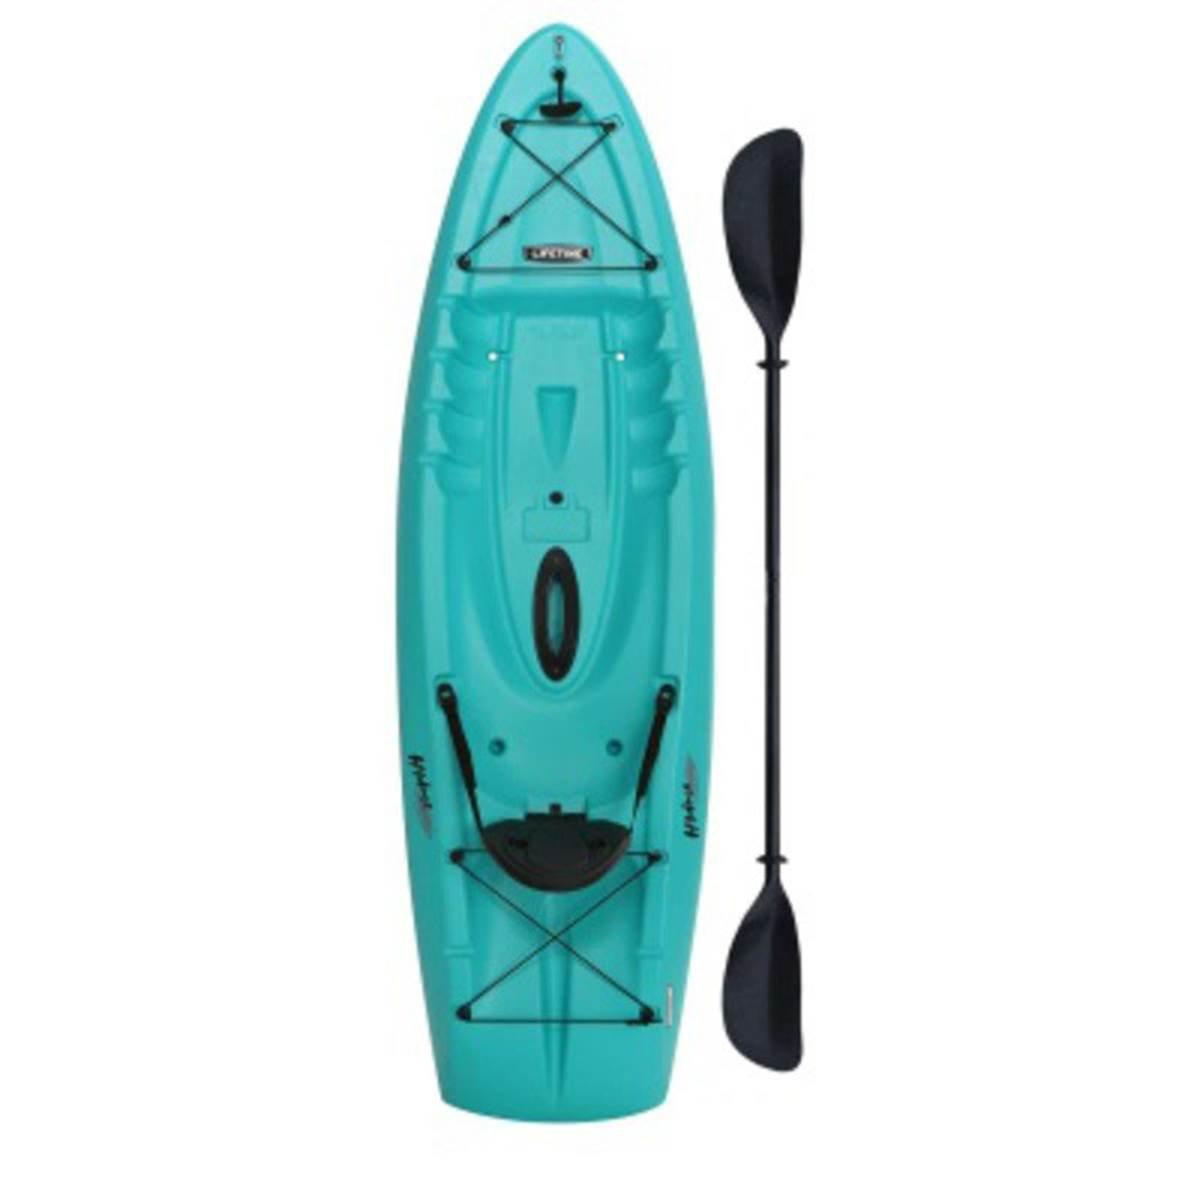 Lifetime Aqua Hydros 8' Kayak With Paddle